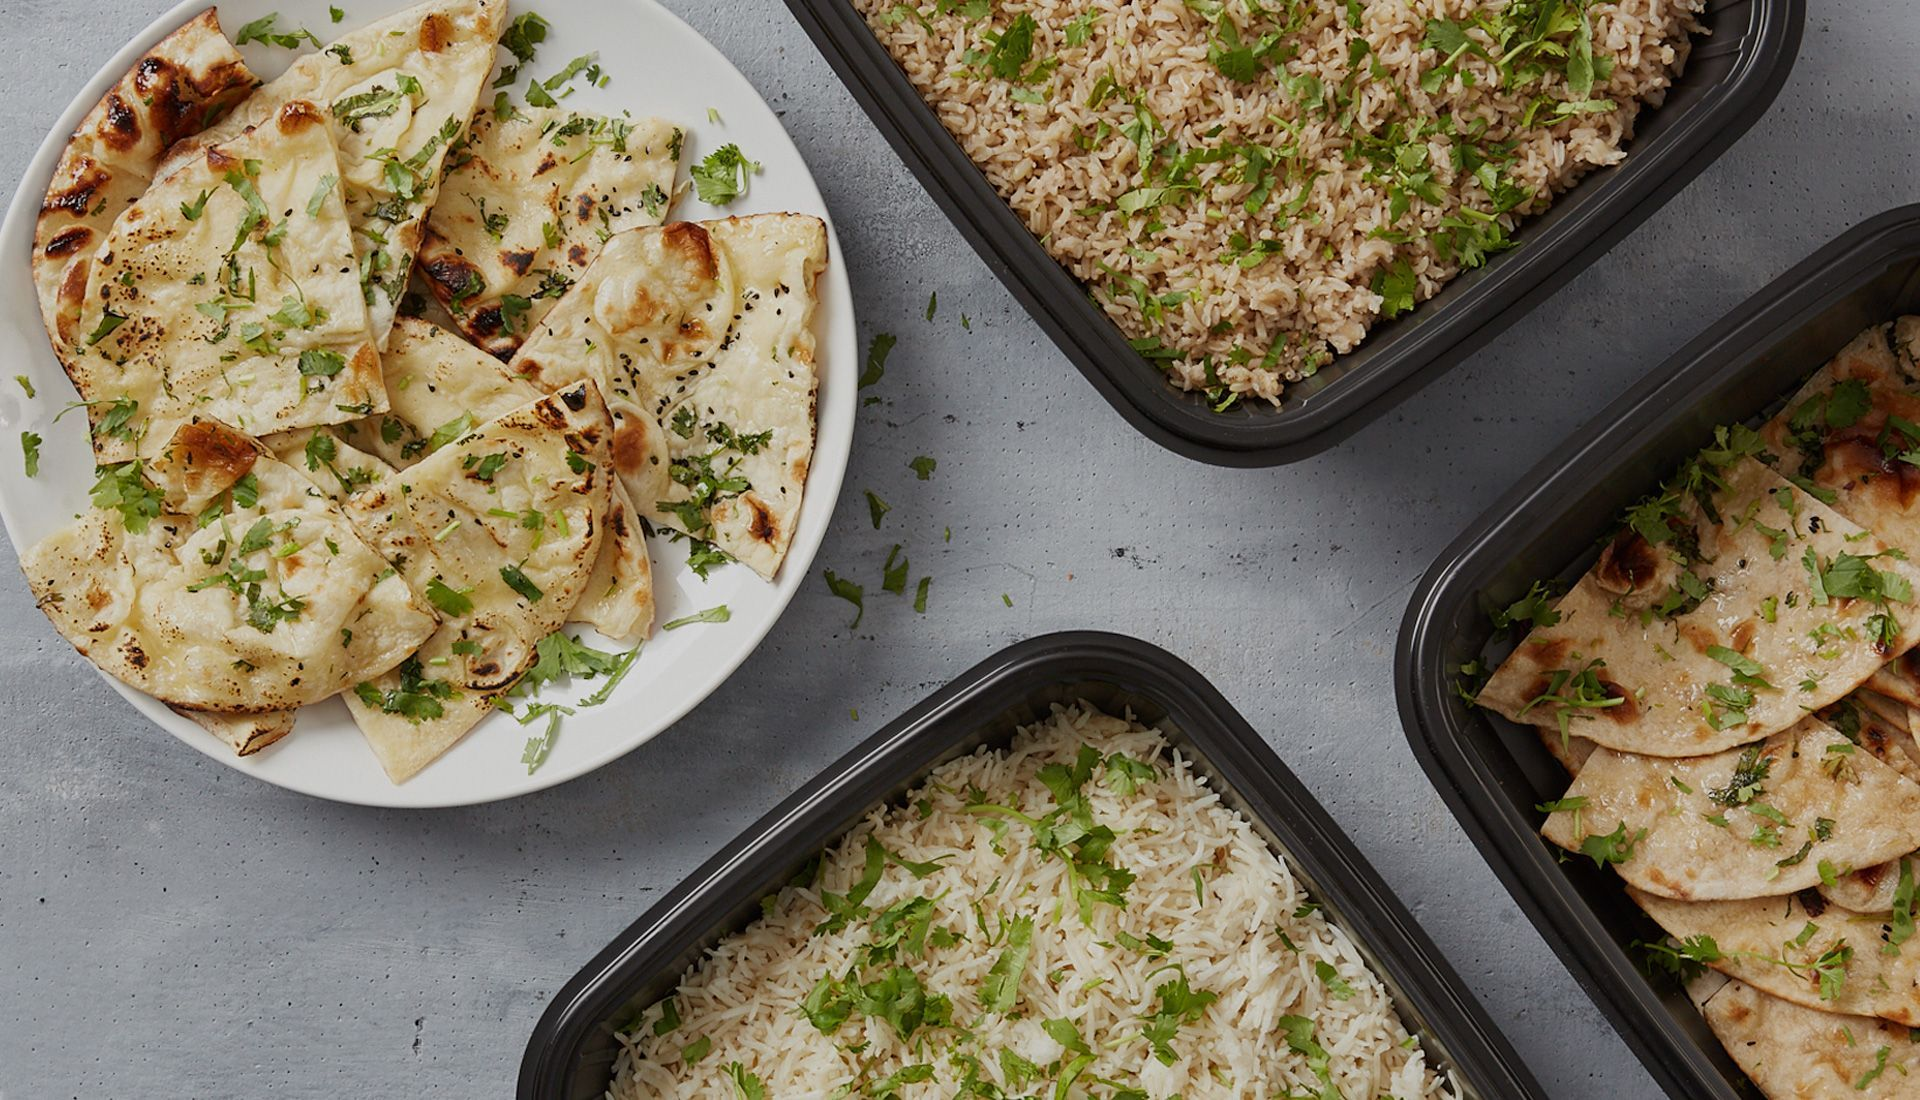 white basmati rice, brown basmati rice, wheat naan and naan on grey background